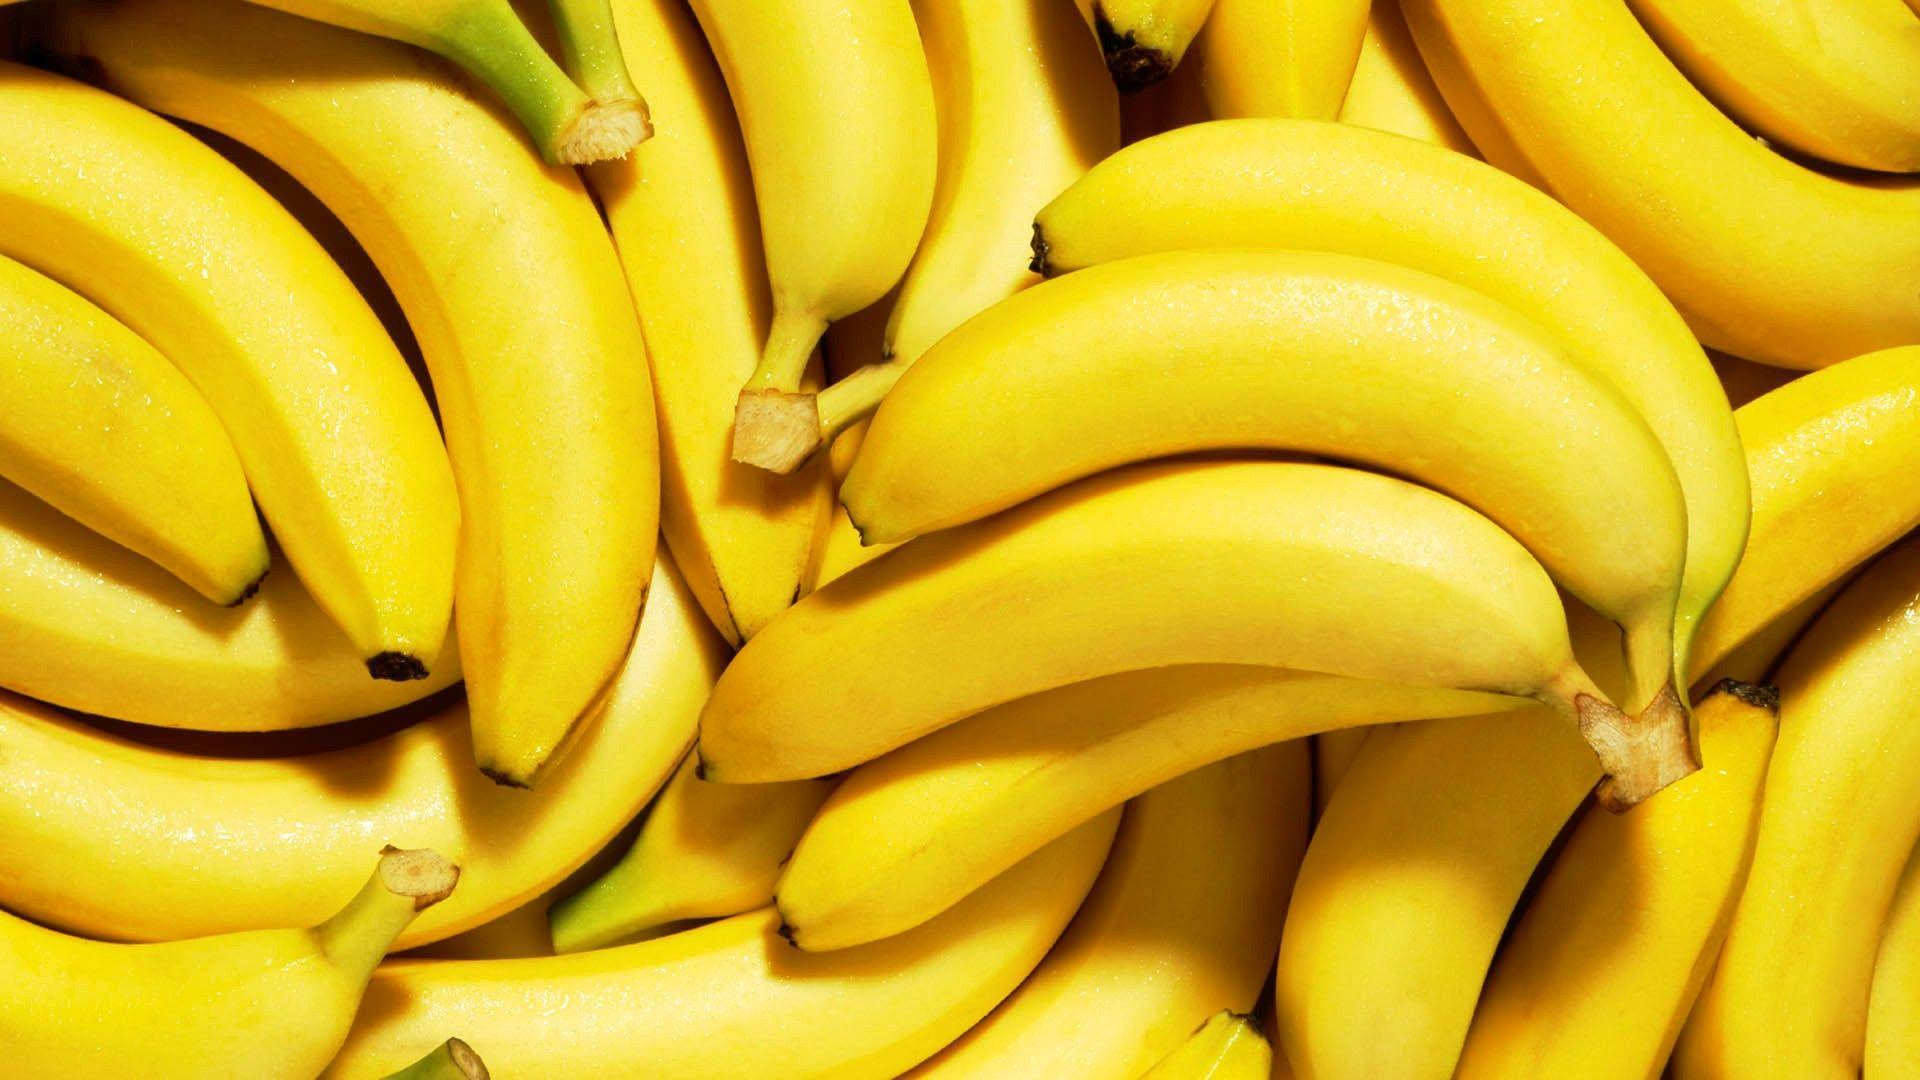 banana wallpapers - wallpaper cave